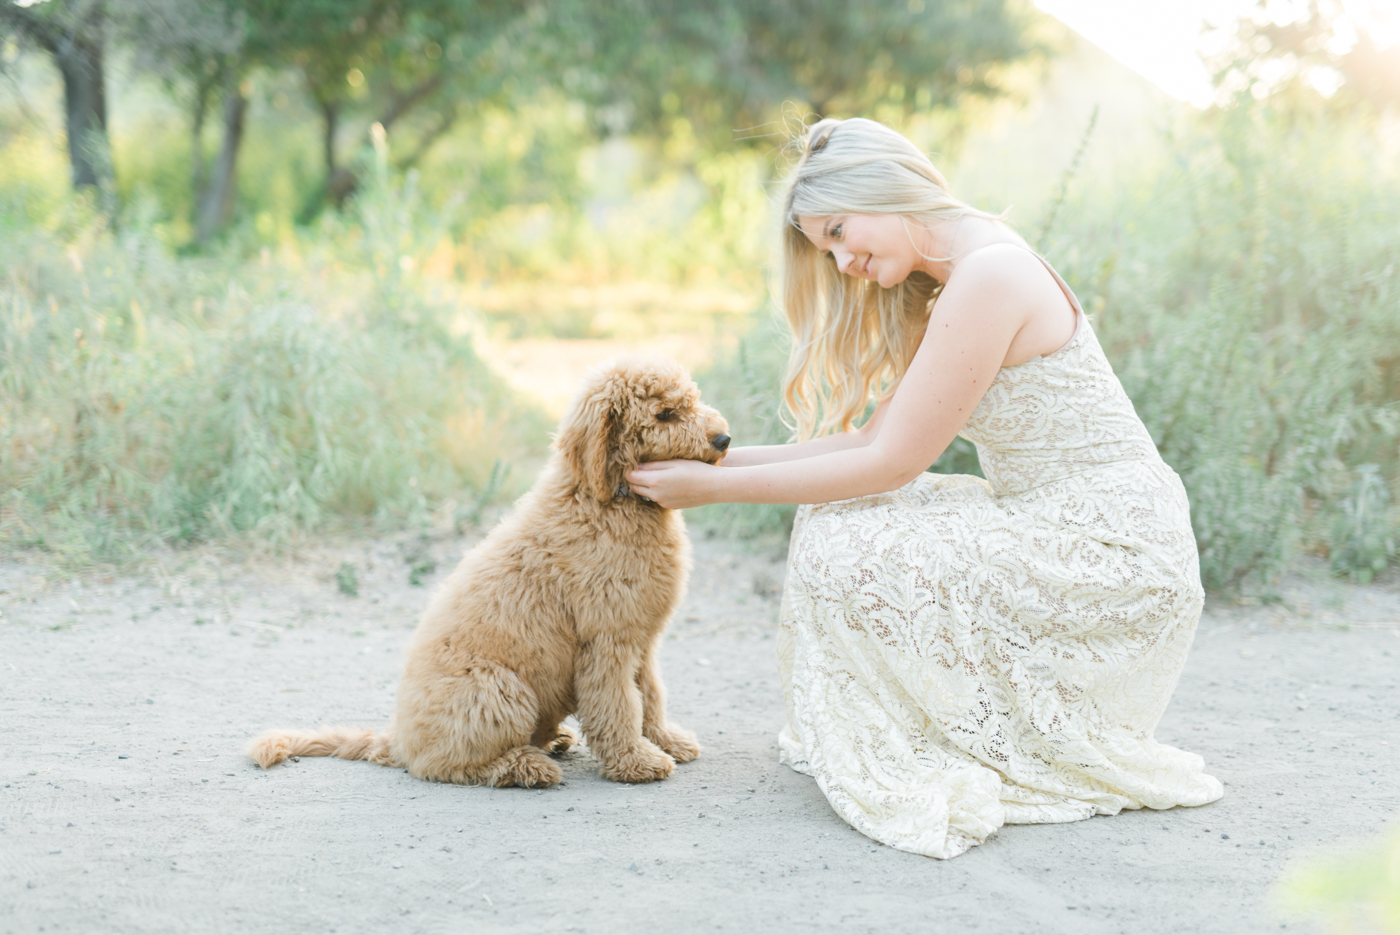 San_Juan_Capistrano_Goldendoodle_family_portrait_session_los_angeles_wedding_photographer-7.jpg